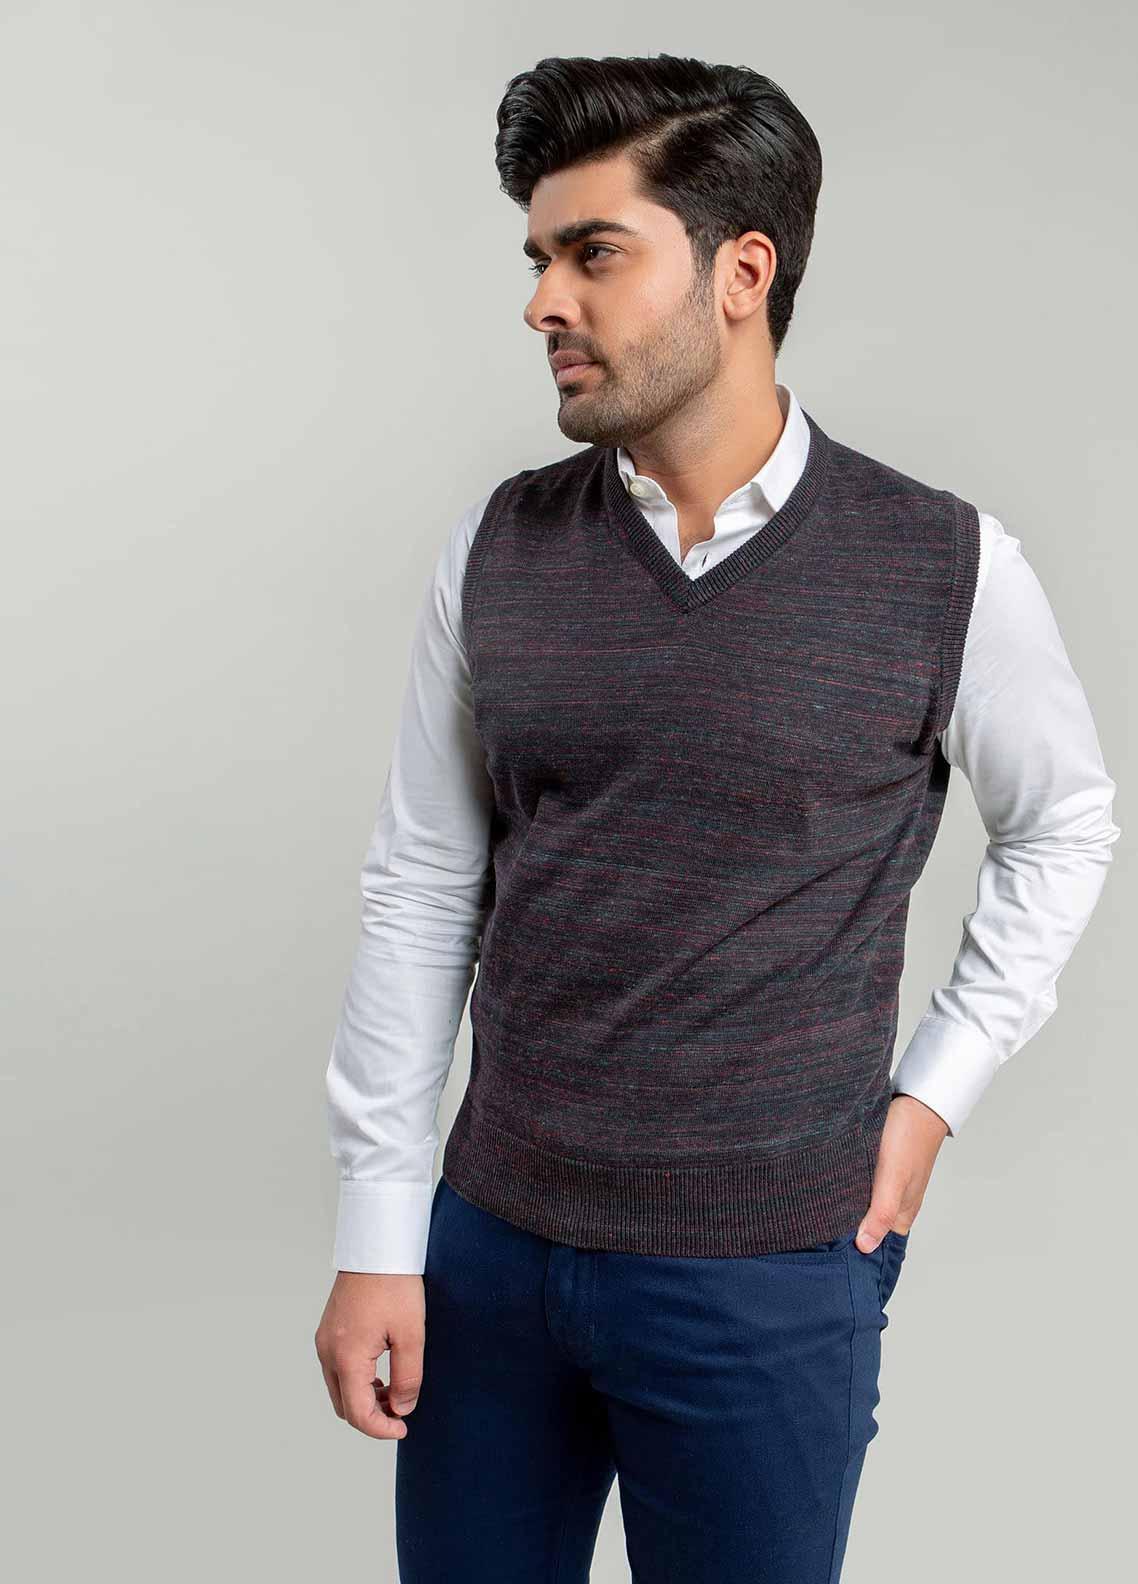 Brumano Cotton Sleeveless Sweaters for Men -  BM20WS Charcoal Patterned Sleeveless V-Neck Sweater